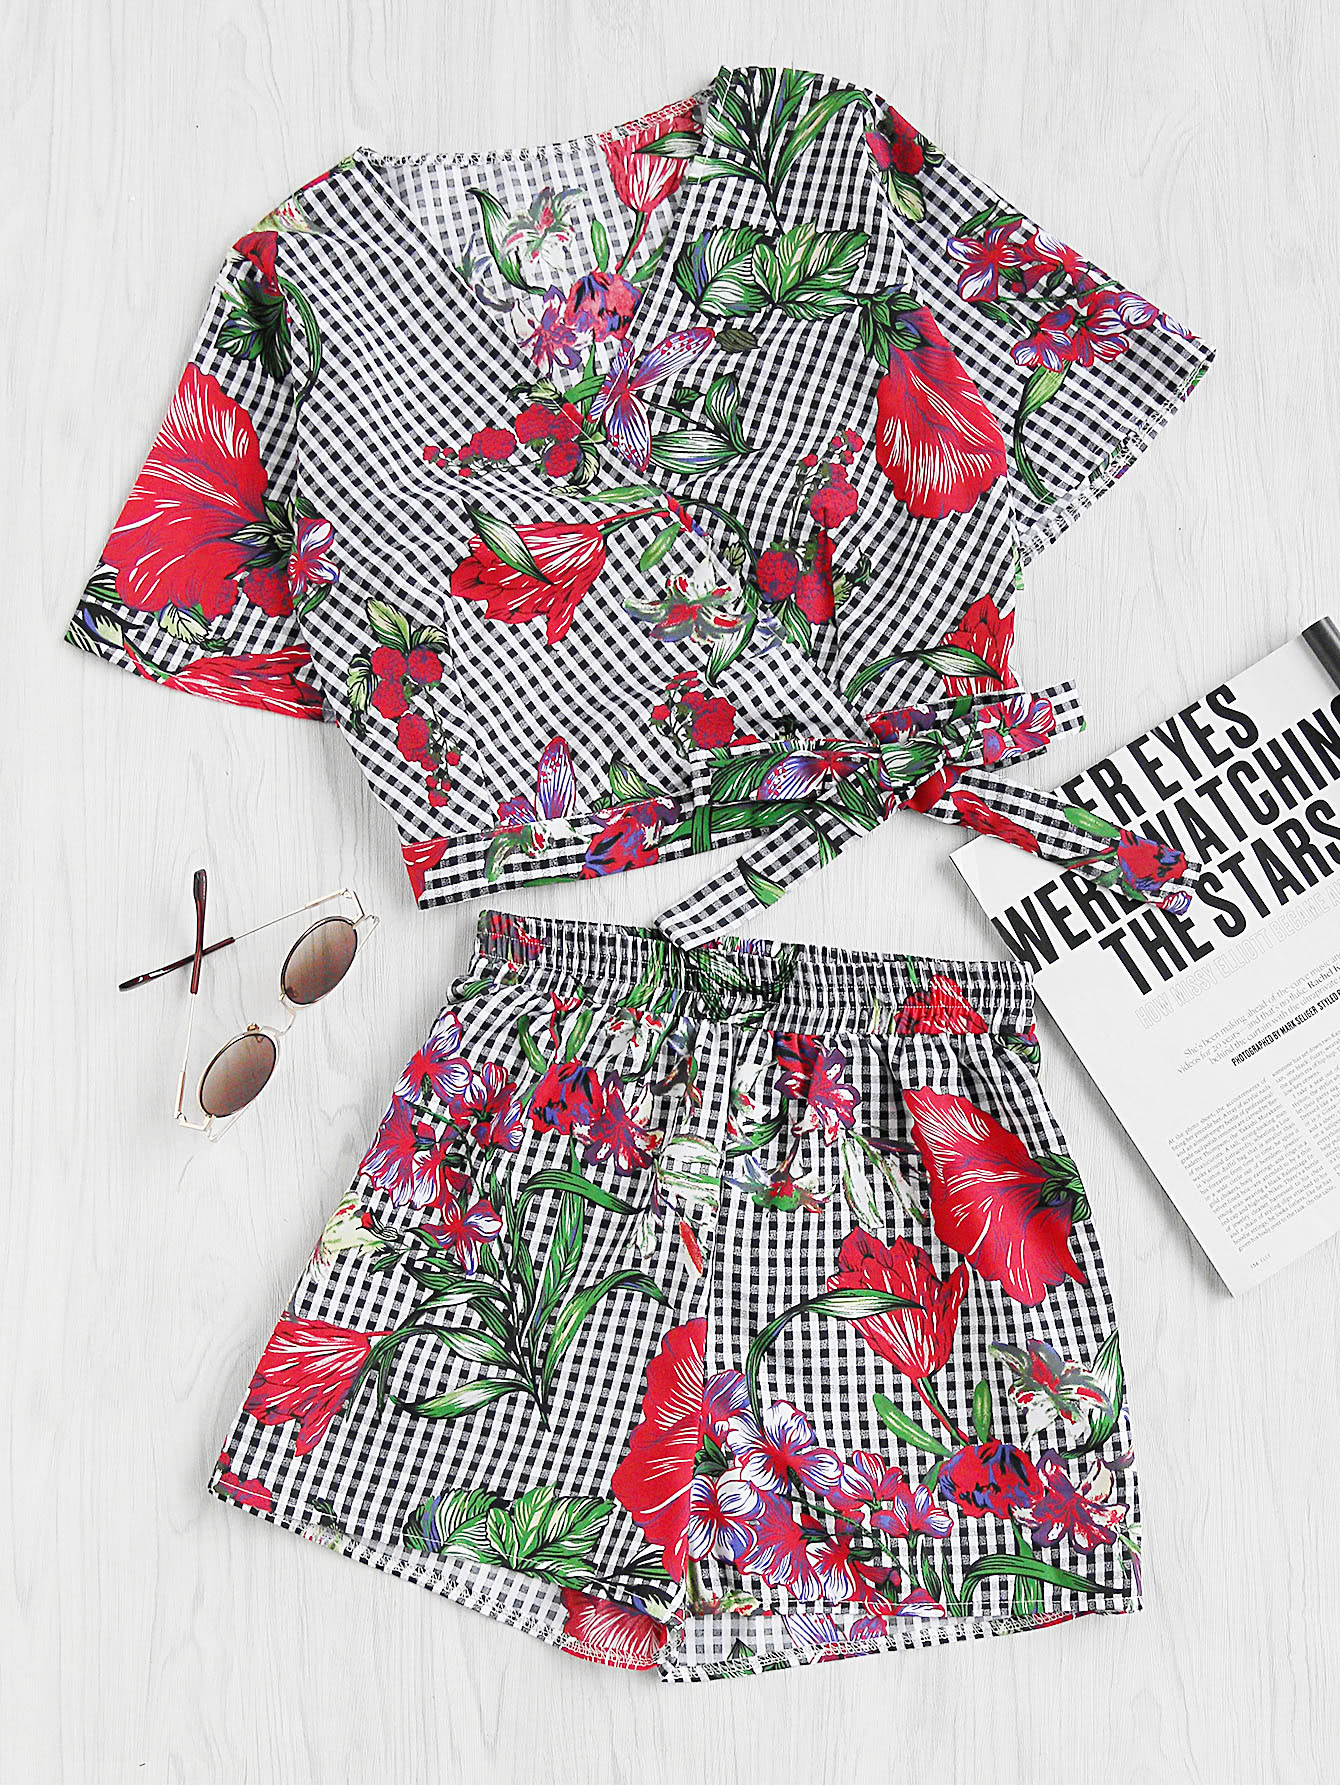 Mixed Print Surplice Wrap Crop Top And Shorts Set twopiece170628454